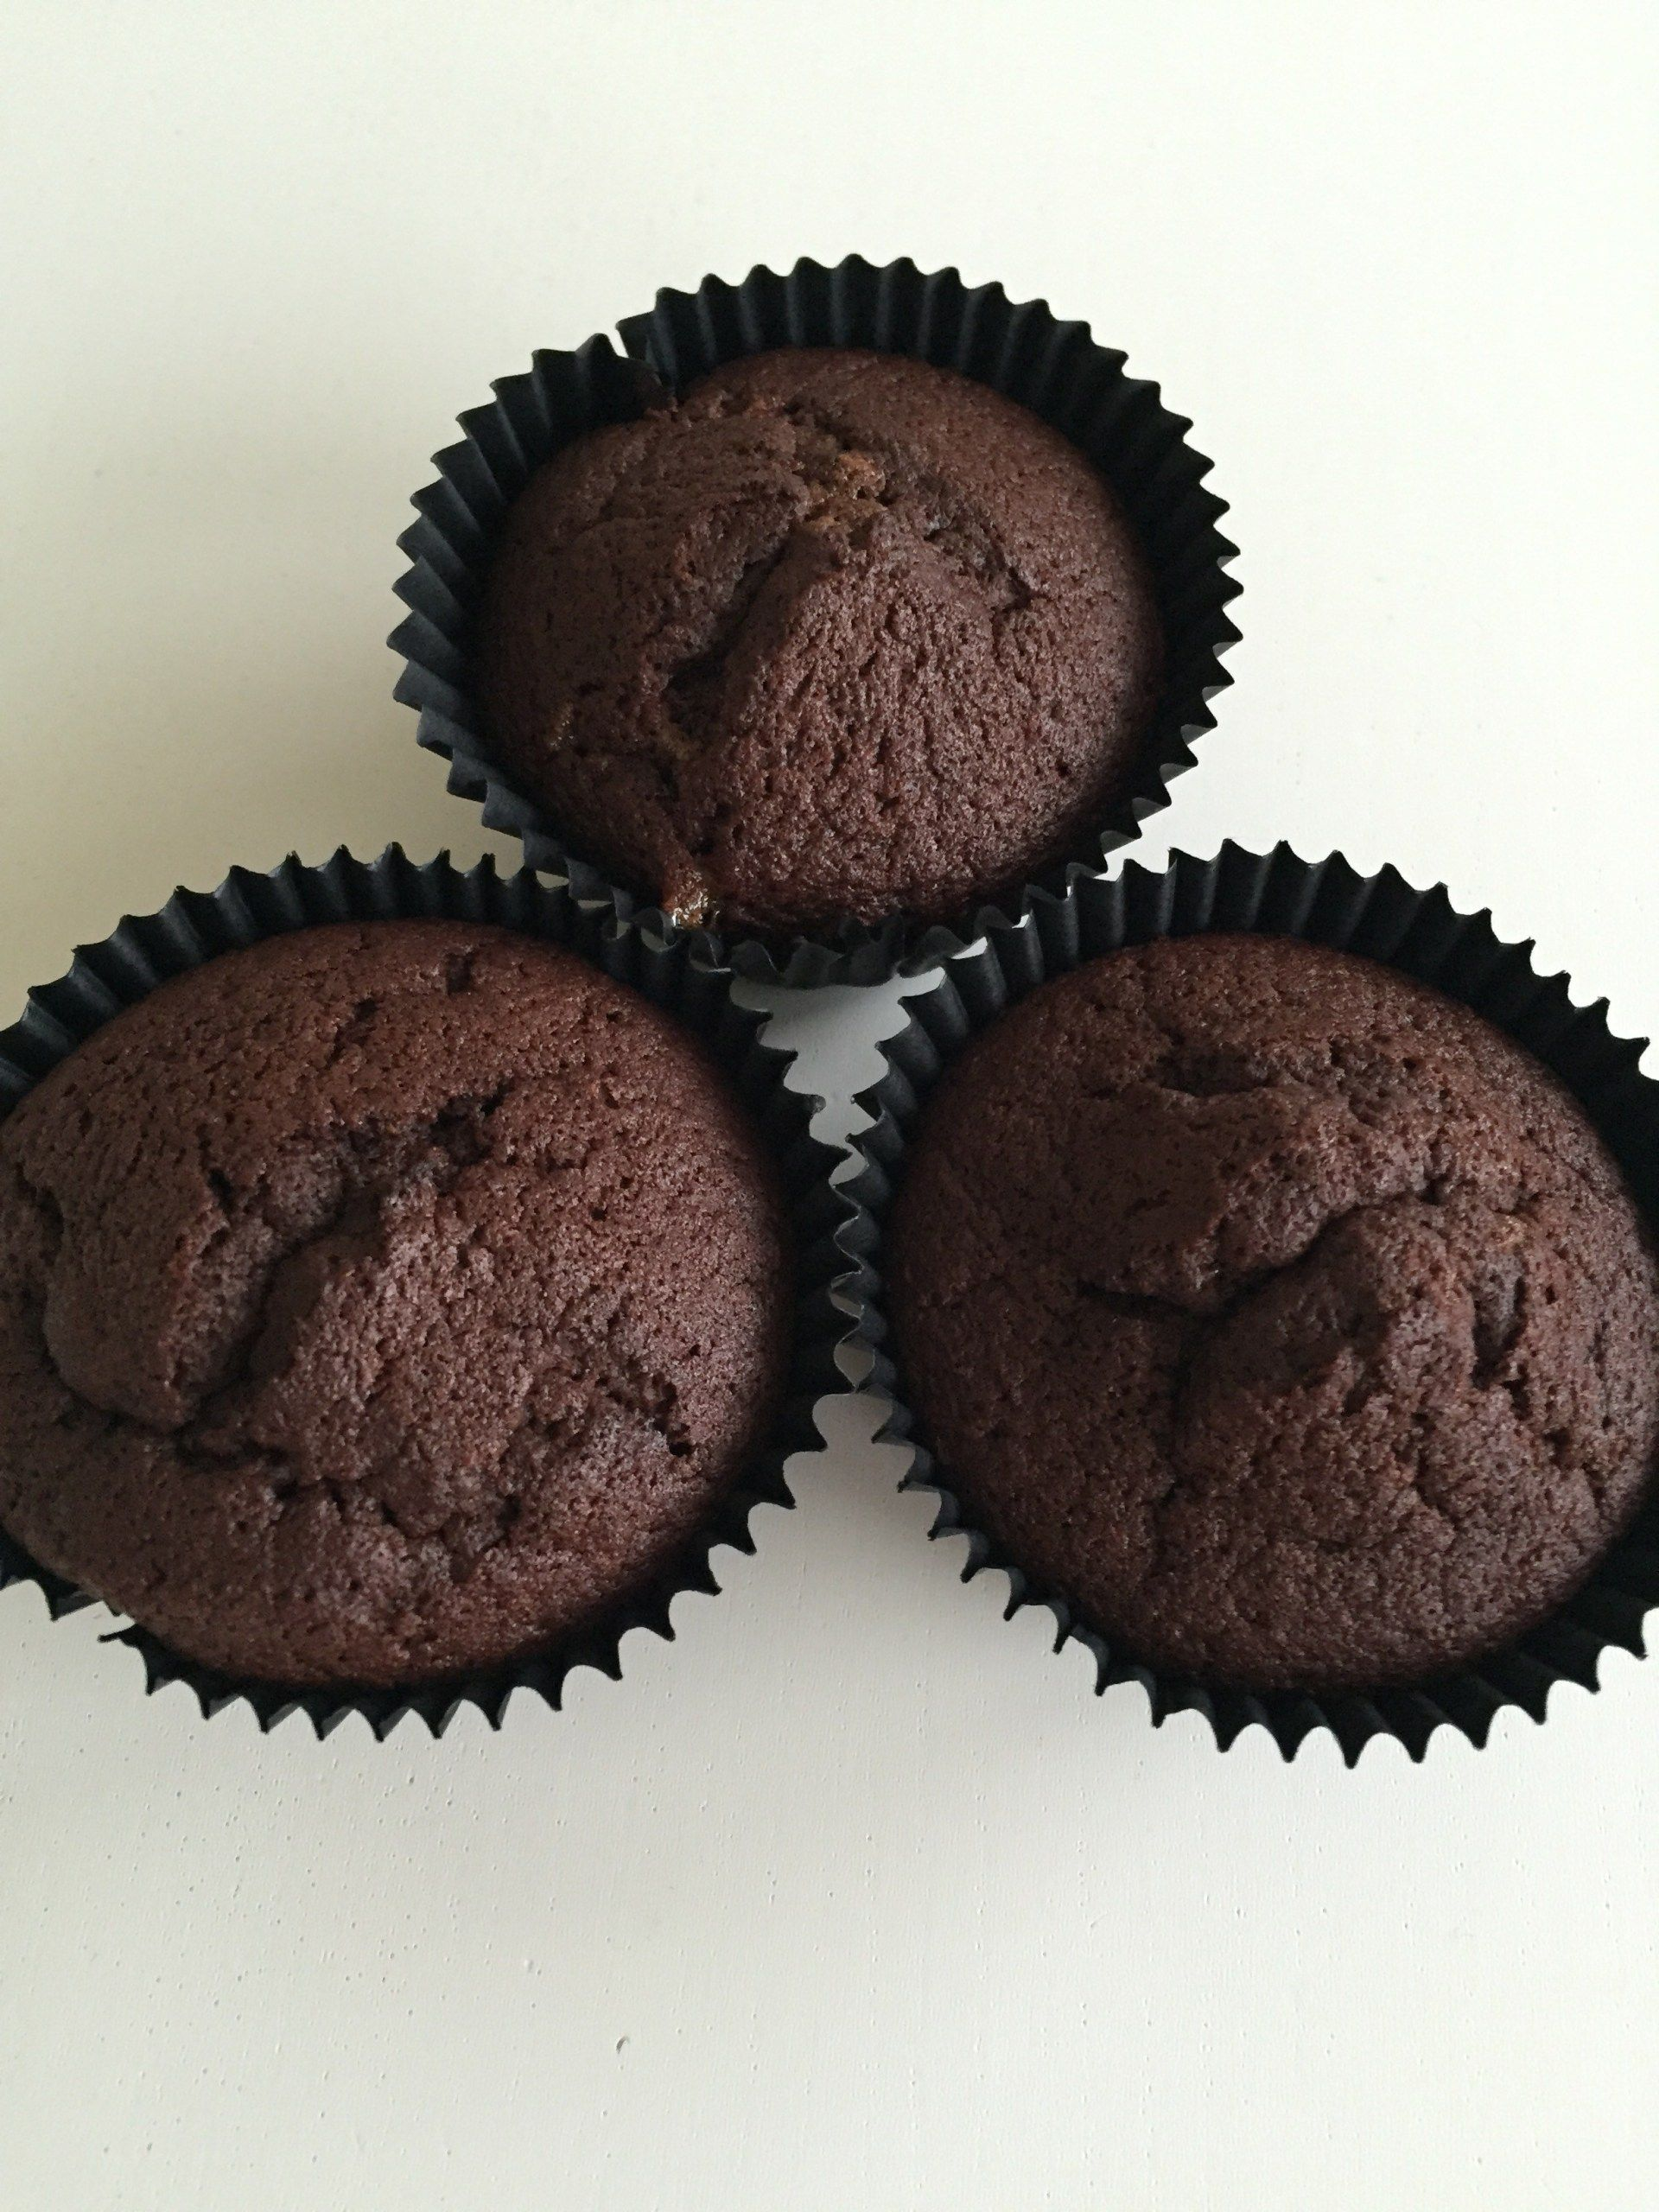 verdens bedste cupcakes